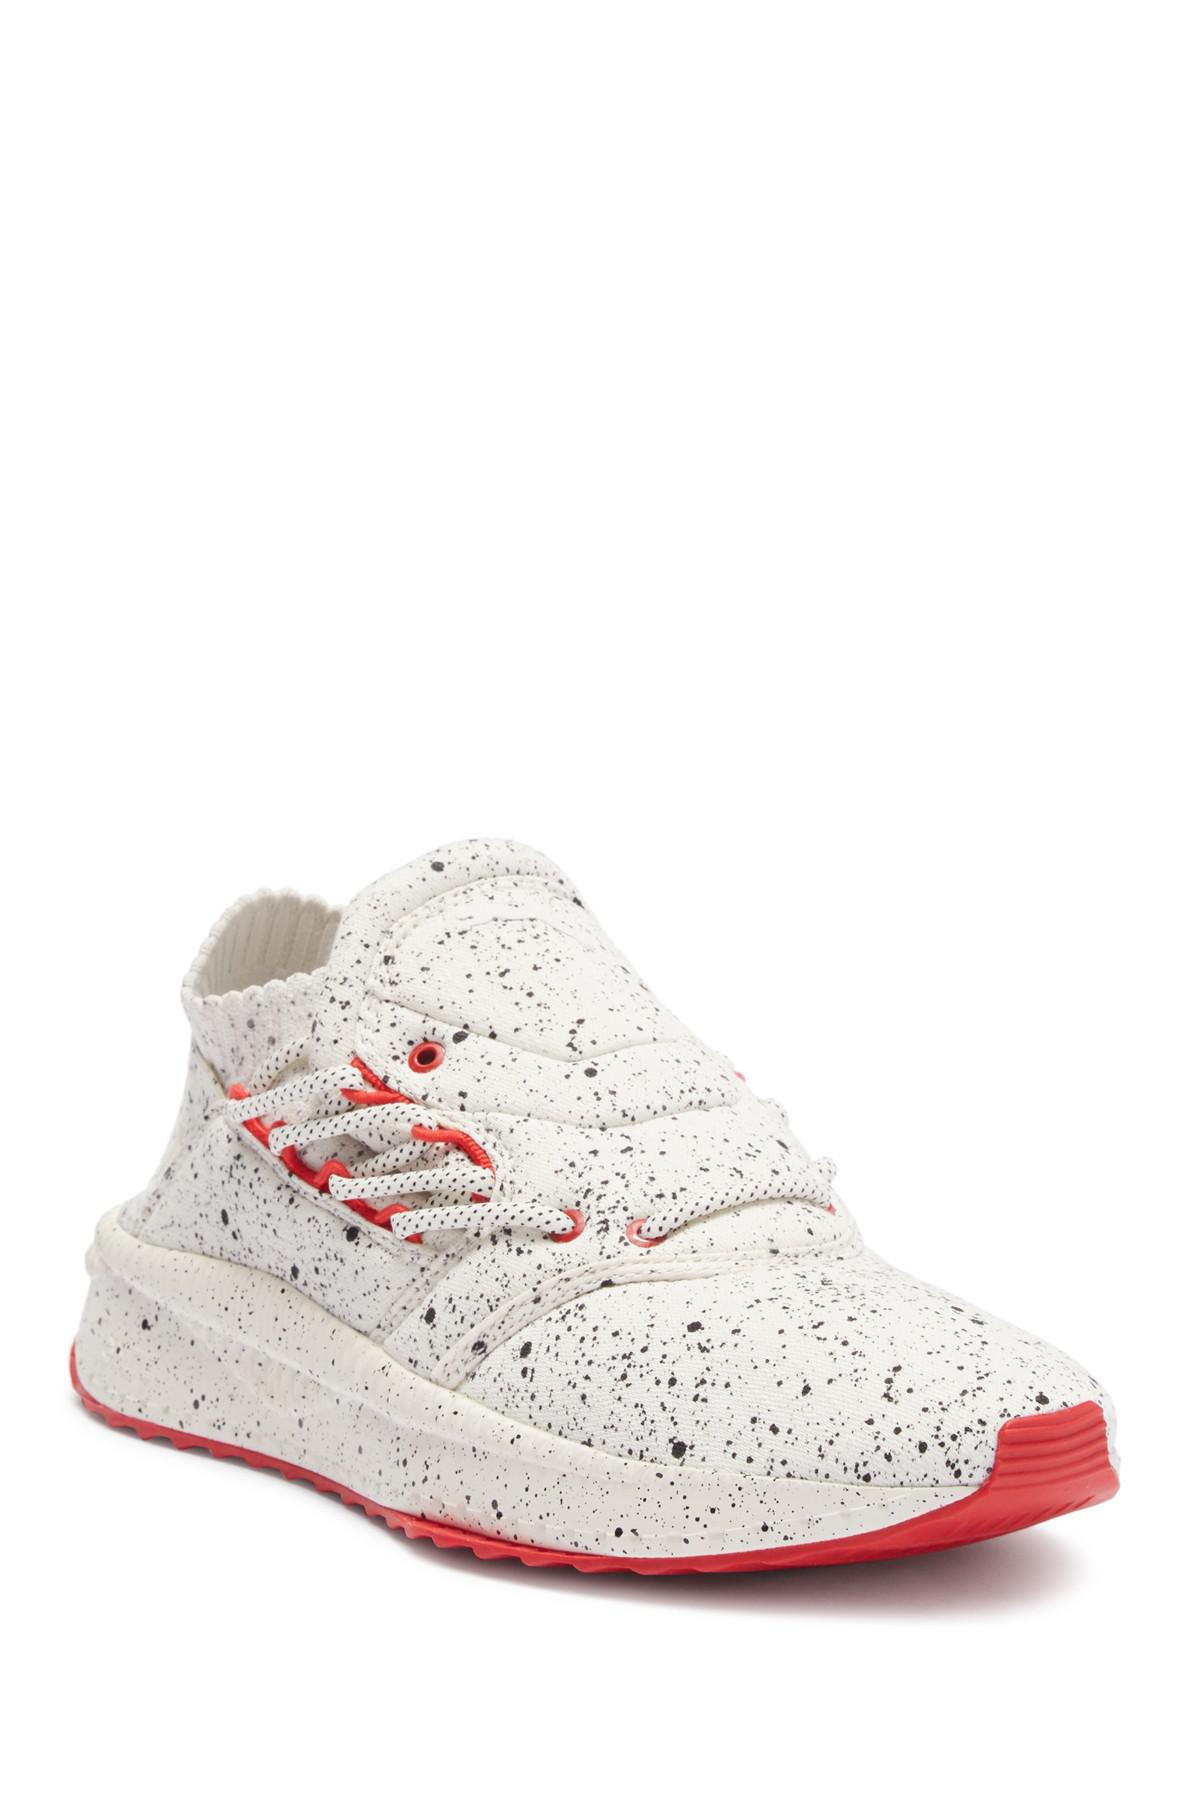 PUMA Tsugi Shinsei K Sneaker in White